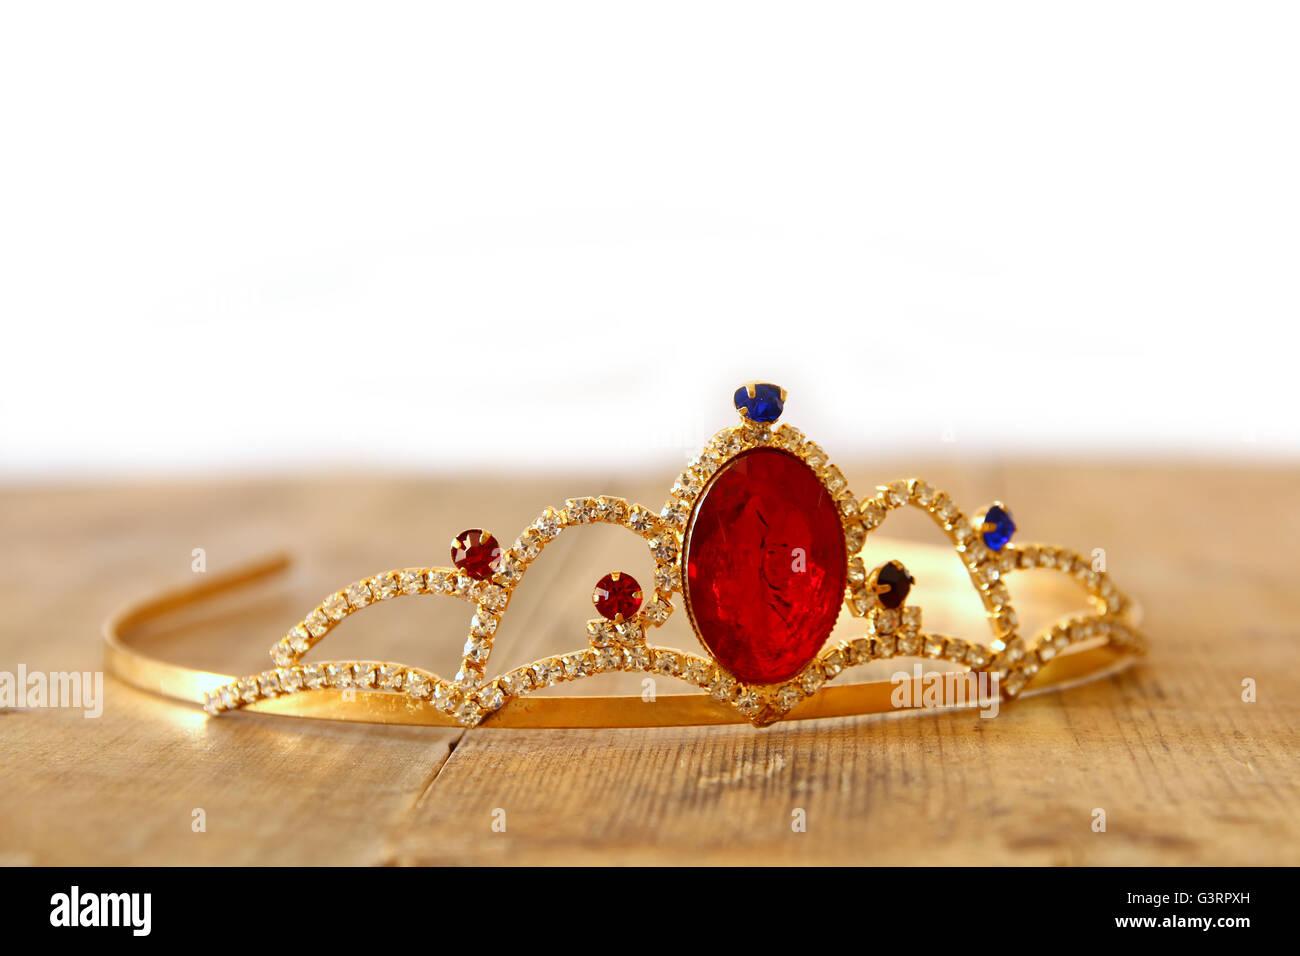 image gold princes crown on stock photos image gold princes crown